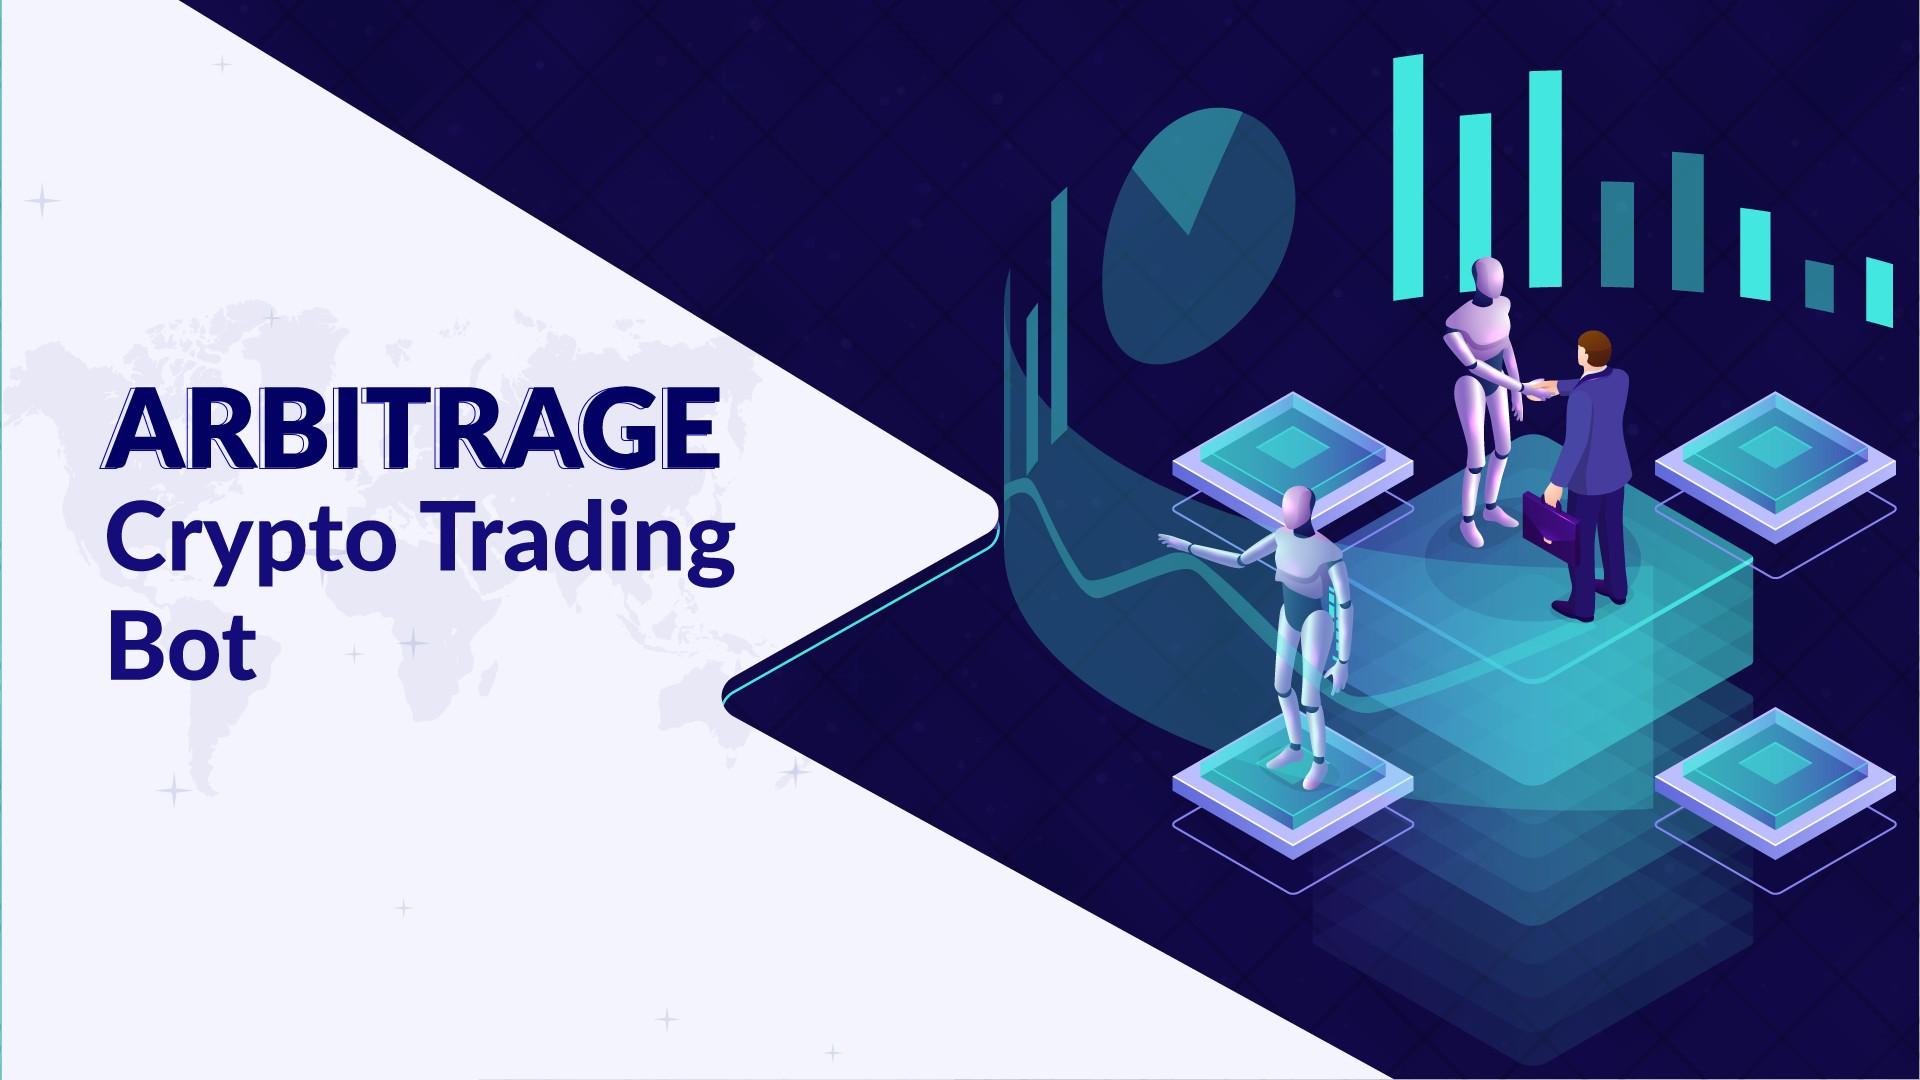 Arbitrage Crypto Trading Bot